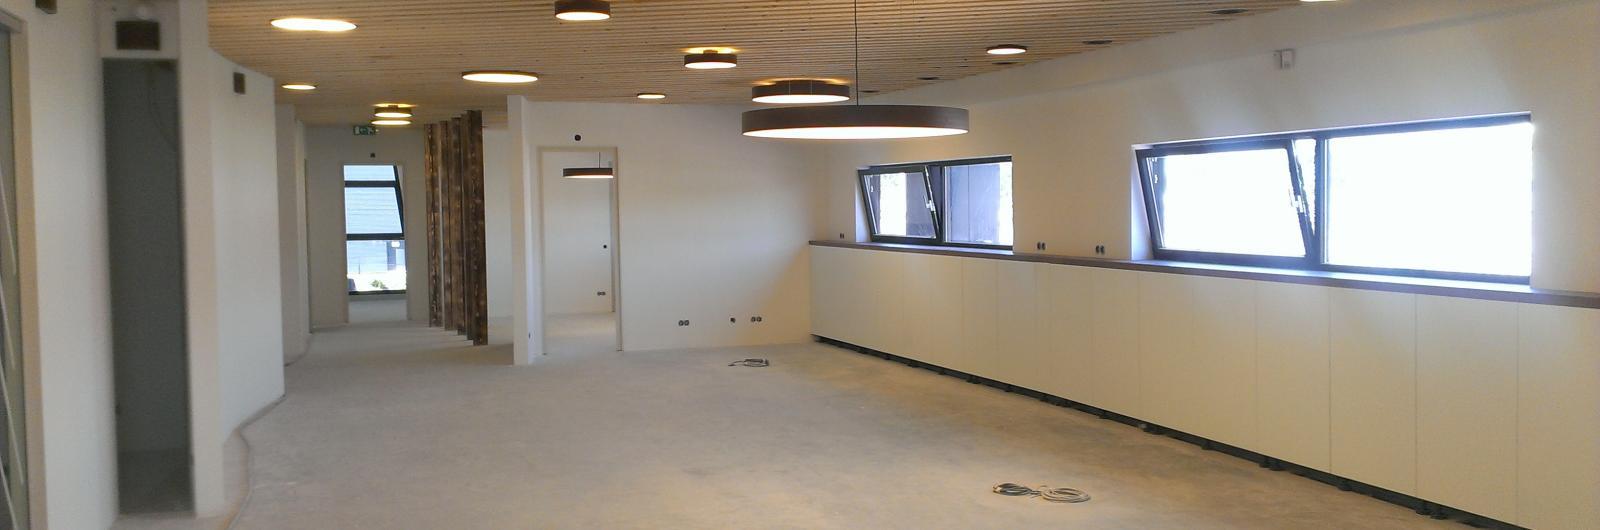 Interieur kantoor oosterhout for Kantoor interieur